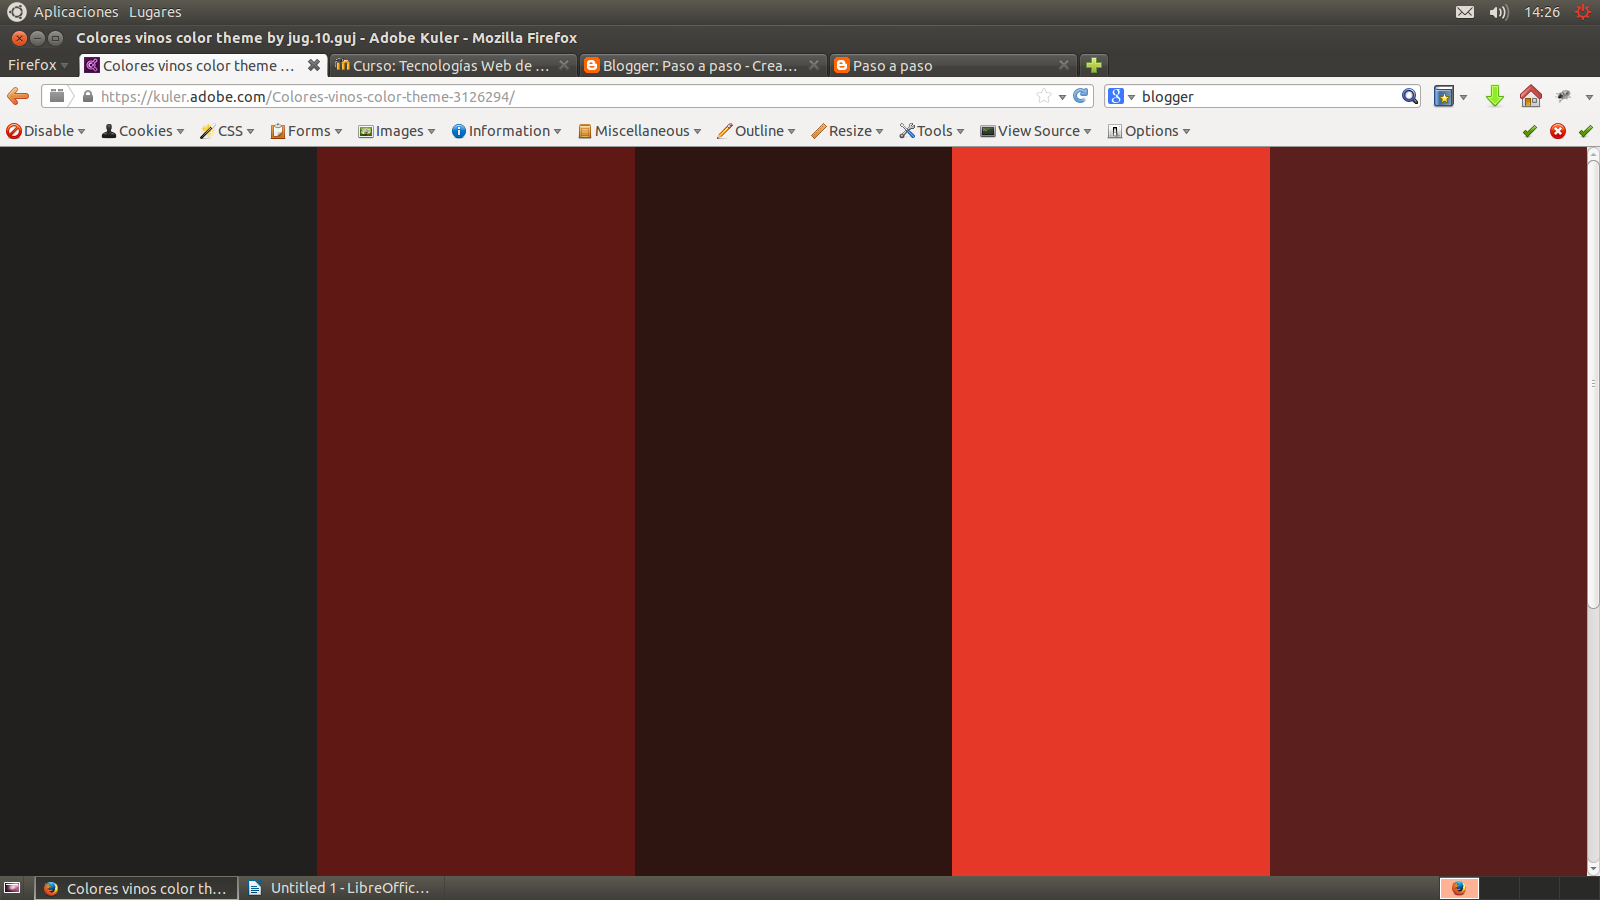 Paso a paso trabajando con paletas de colores for Paleta de colores grises